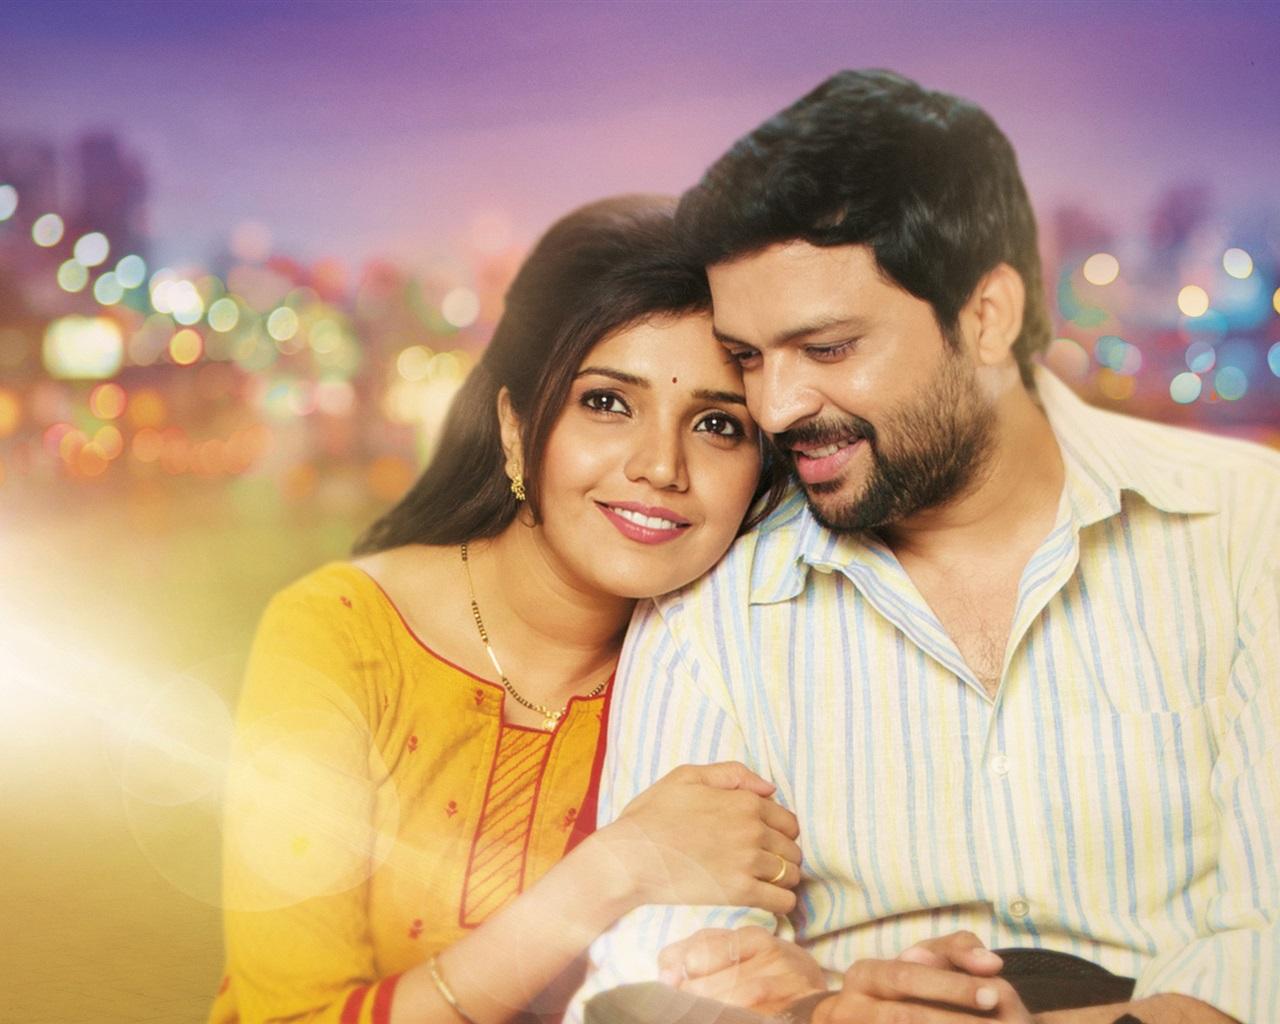 Guddu rangeela movie download filmywap